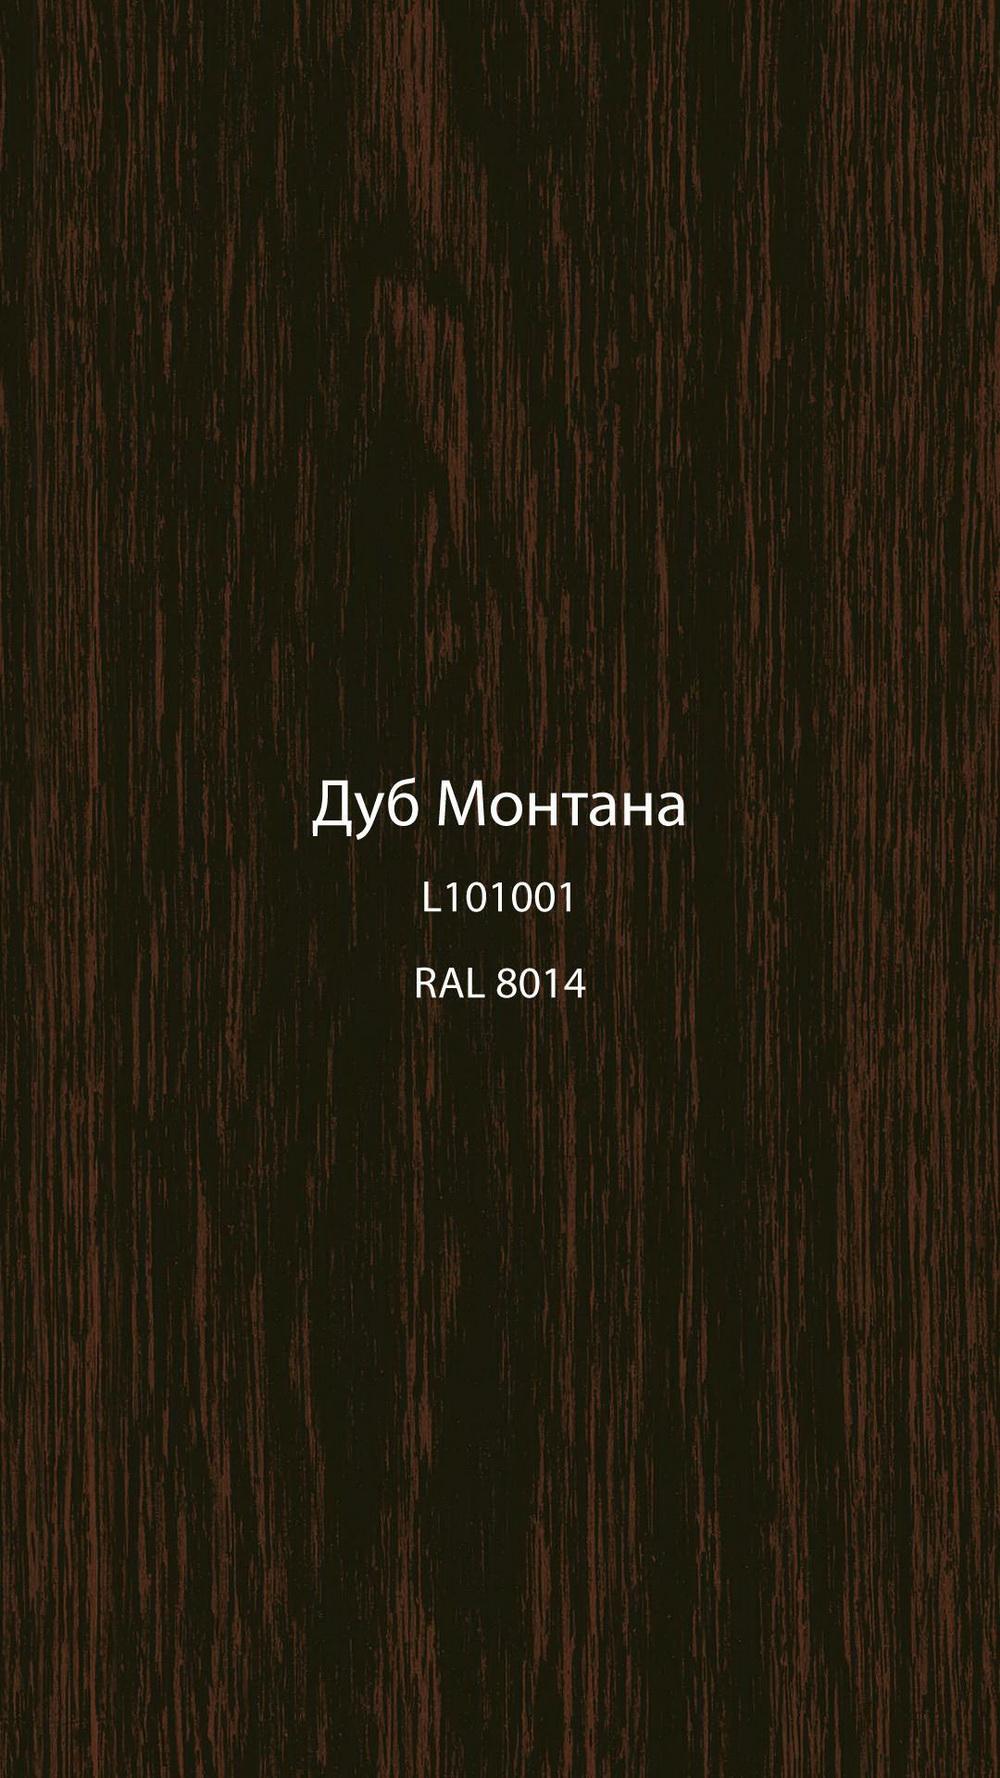 Дуб Монтана - колір ламінації профілів заводу EKIPAZH